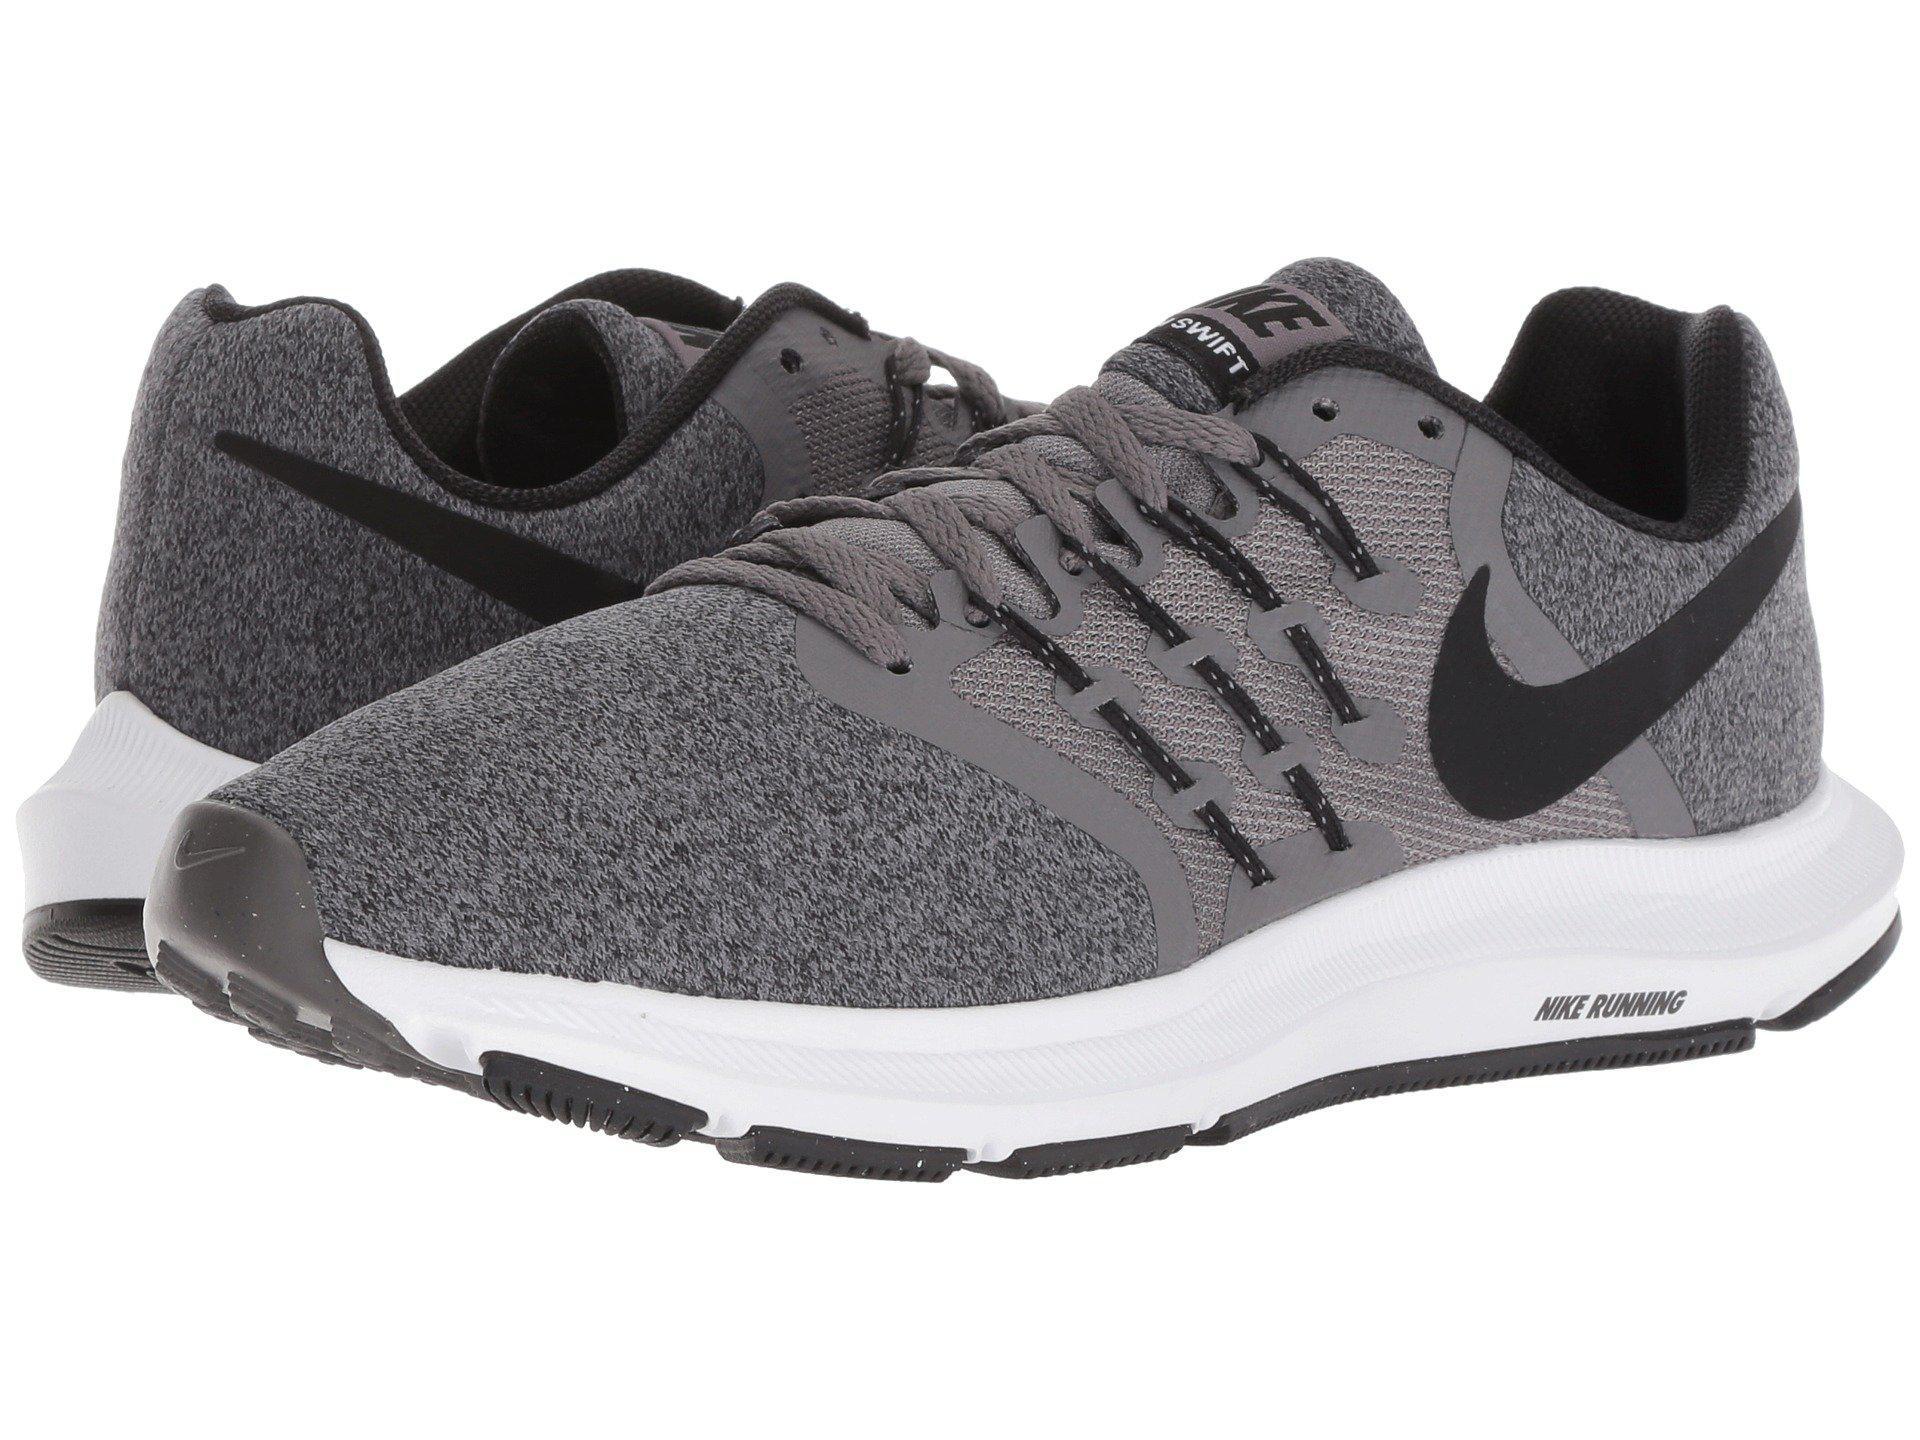 dd58fe936103d nike-GunsmokeBlackWhite-Run-Swift-blackhyper-Jadedark-Greywhite-Womens-Running-Shoes.jpeg